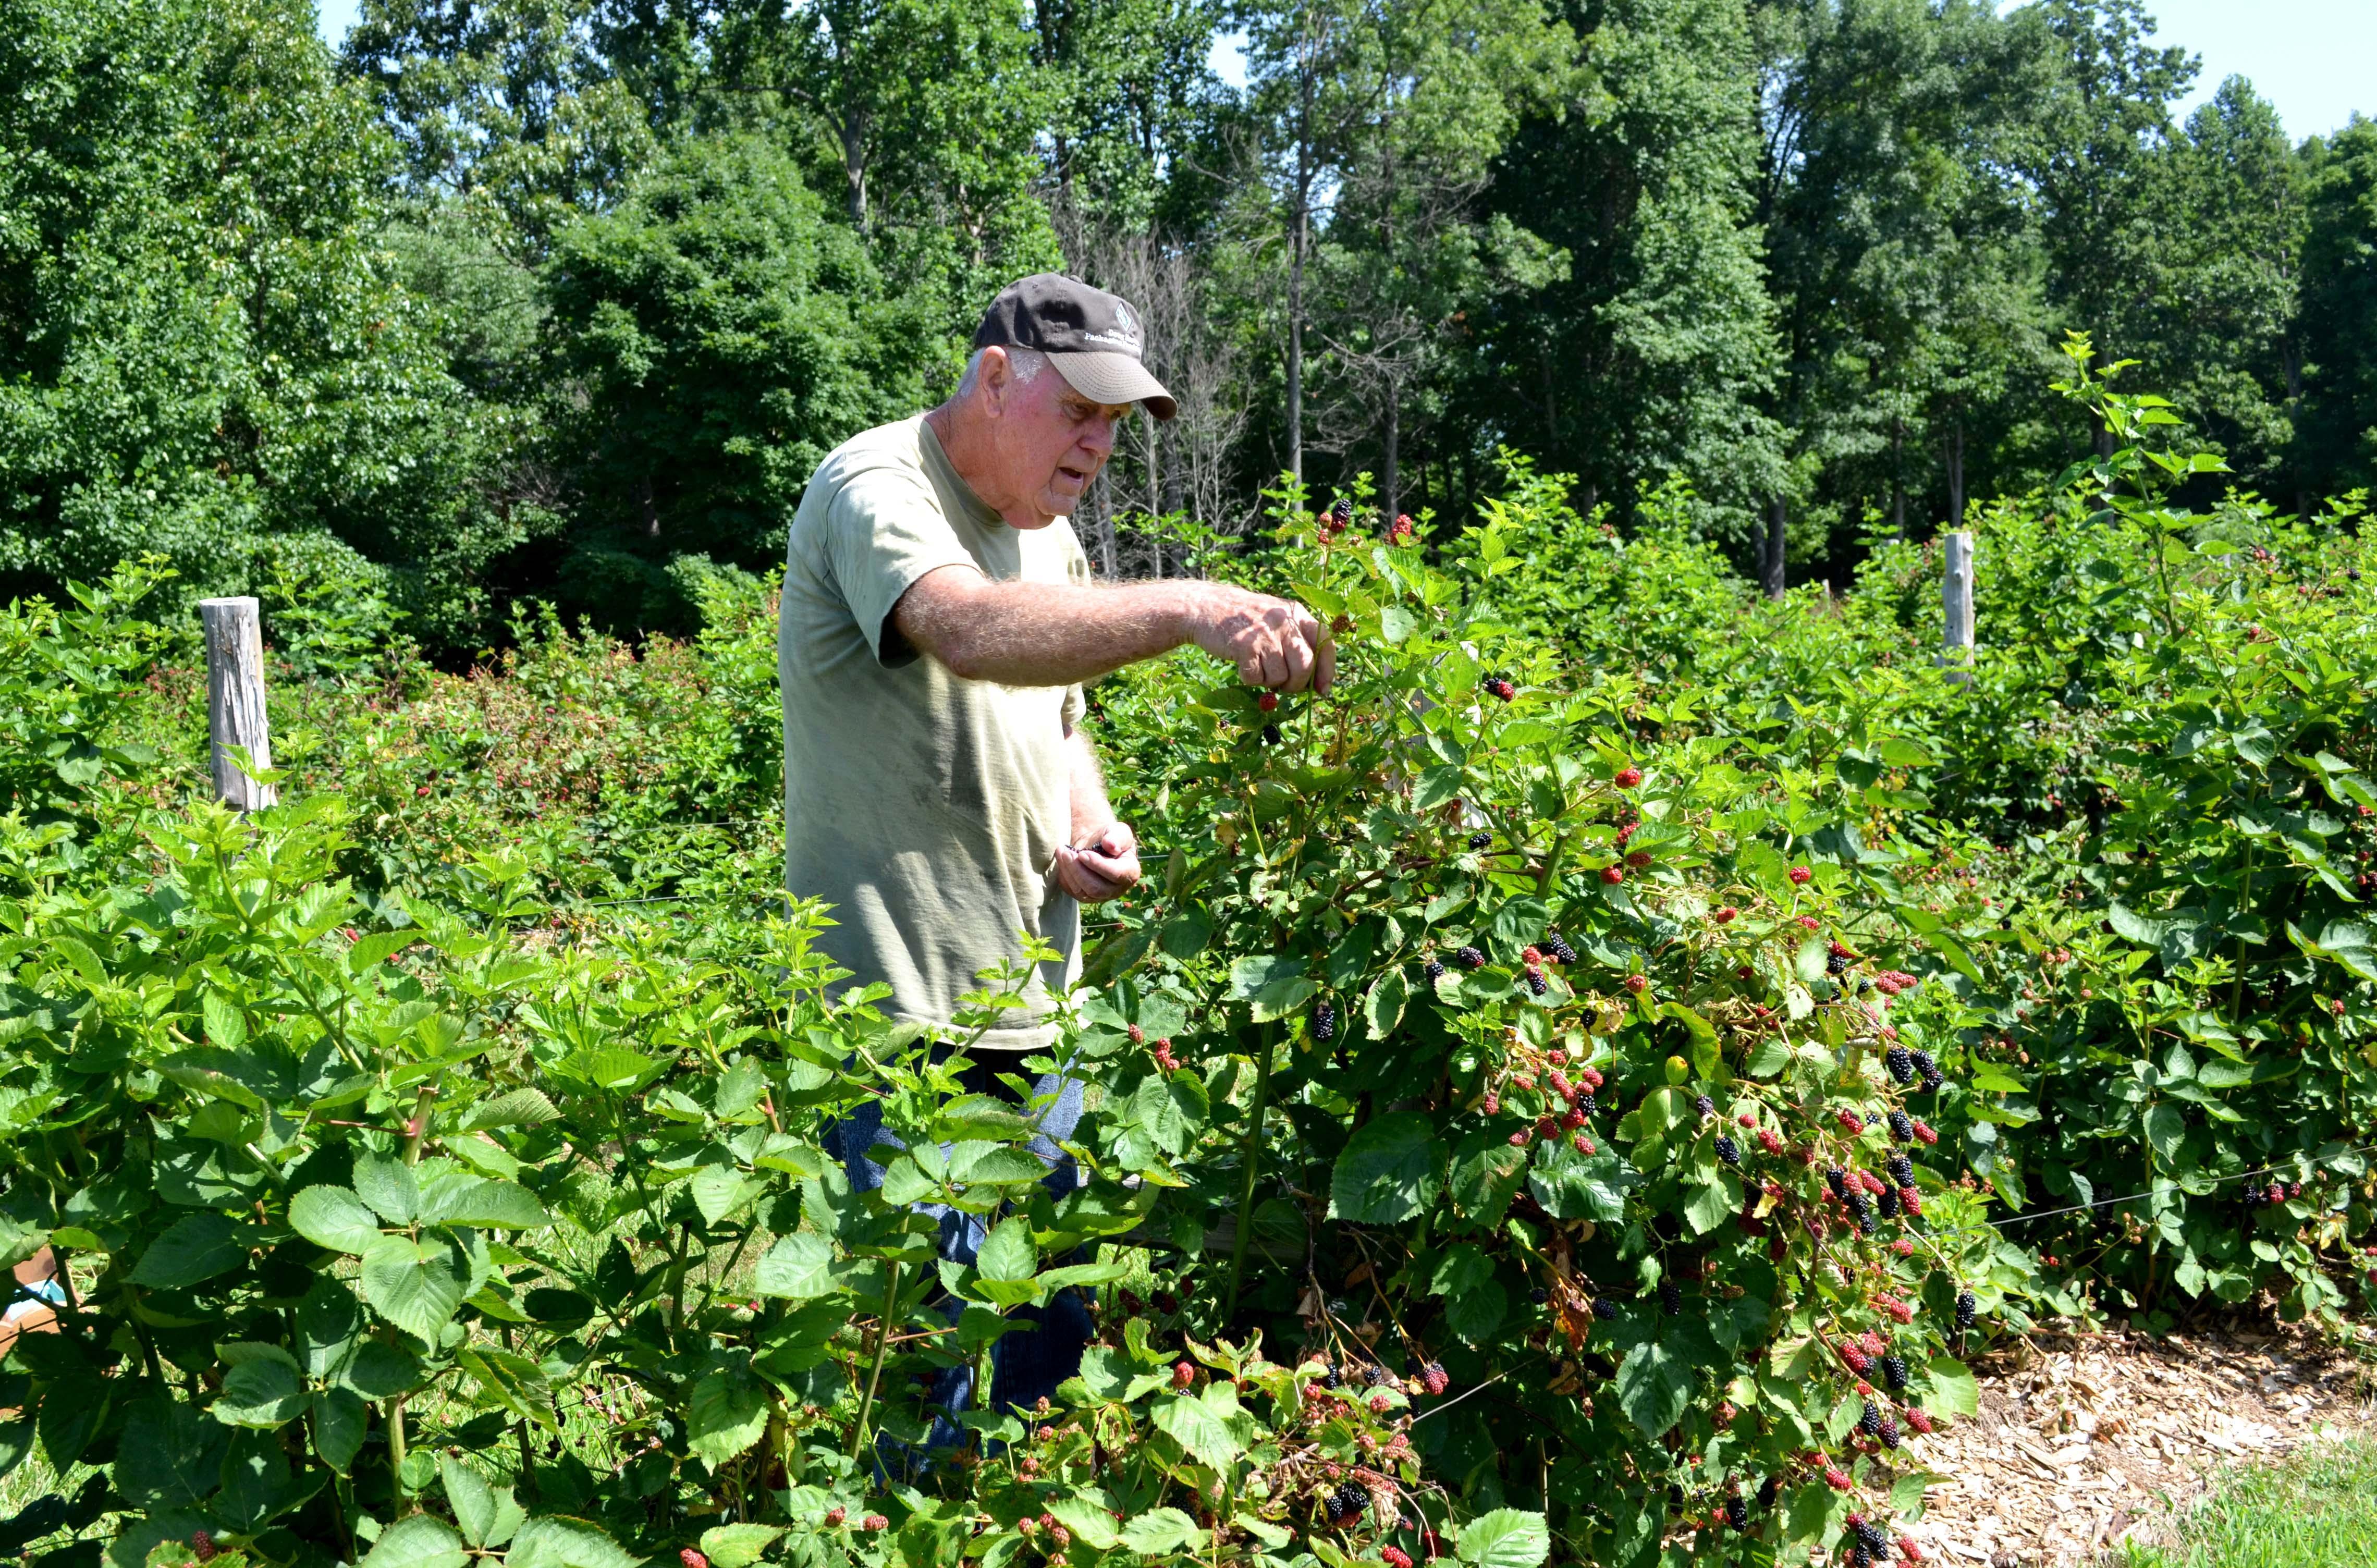 Bennie Winn picks blackberries on his Muhlenberg County farm. Photo by Katie Pratt, UK agricultural communications.